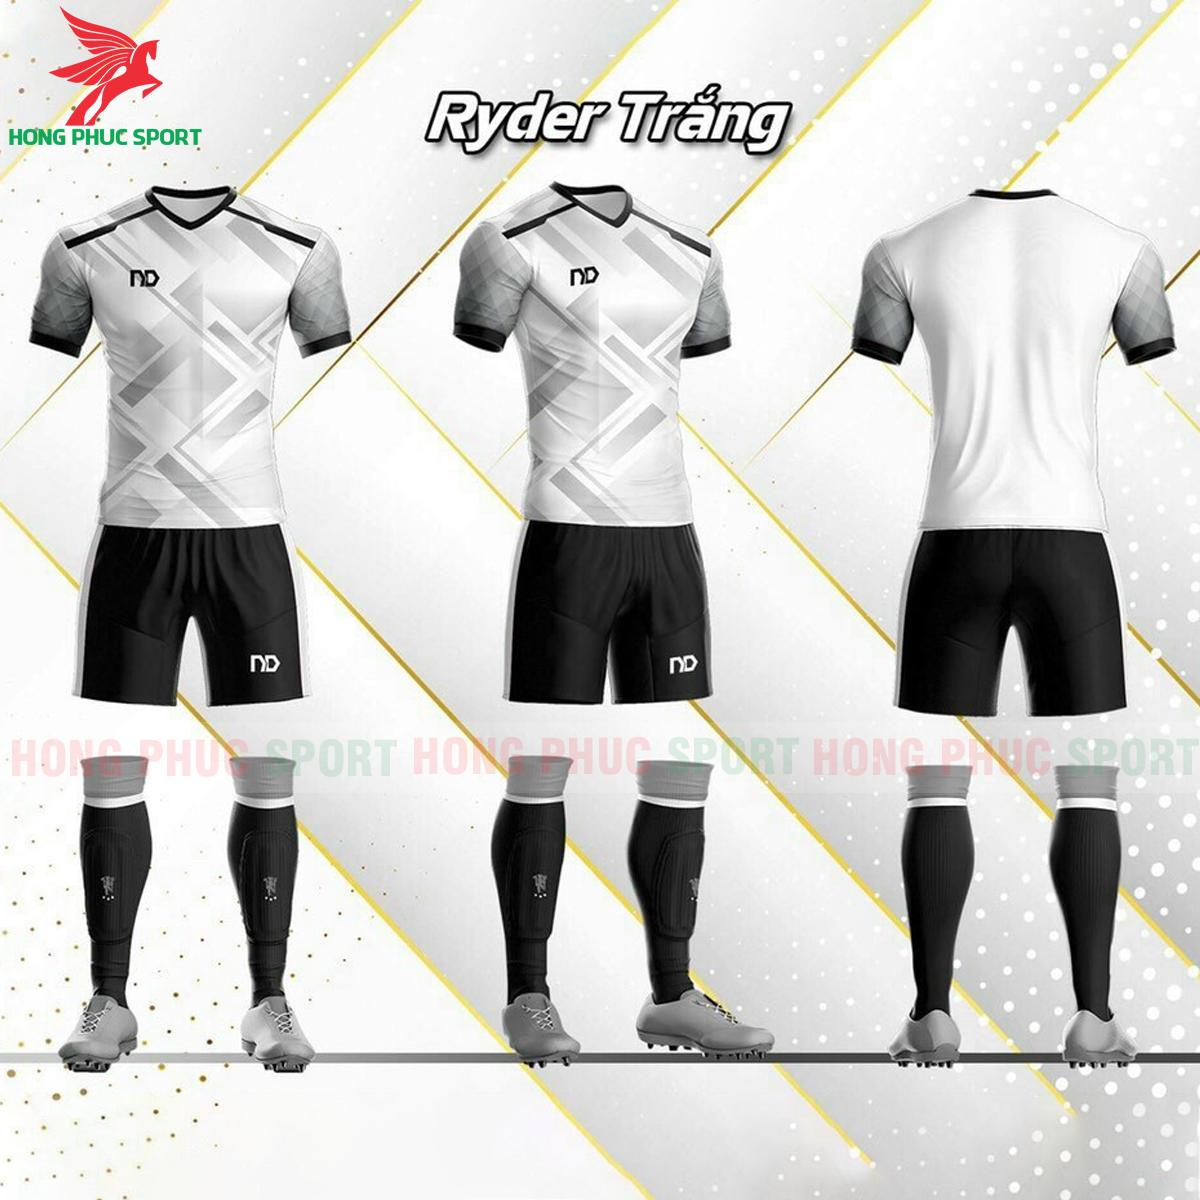 https://cdn.hongphucsport.com/unsafe/s4.shopbay.vn/files/285/ao-khong-logo-nd-ryder-2021-mau-trang-606d247fe5244.png